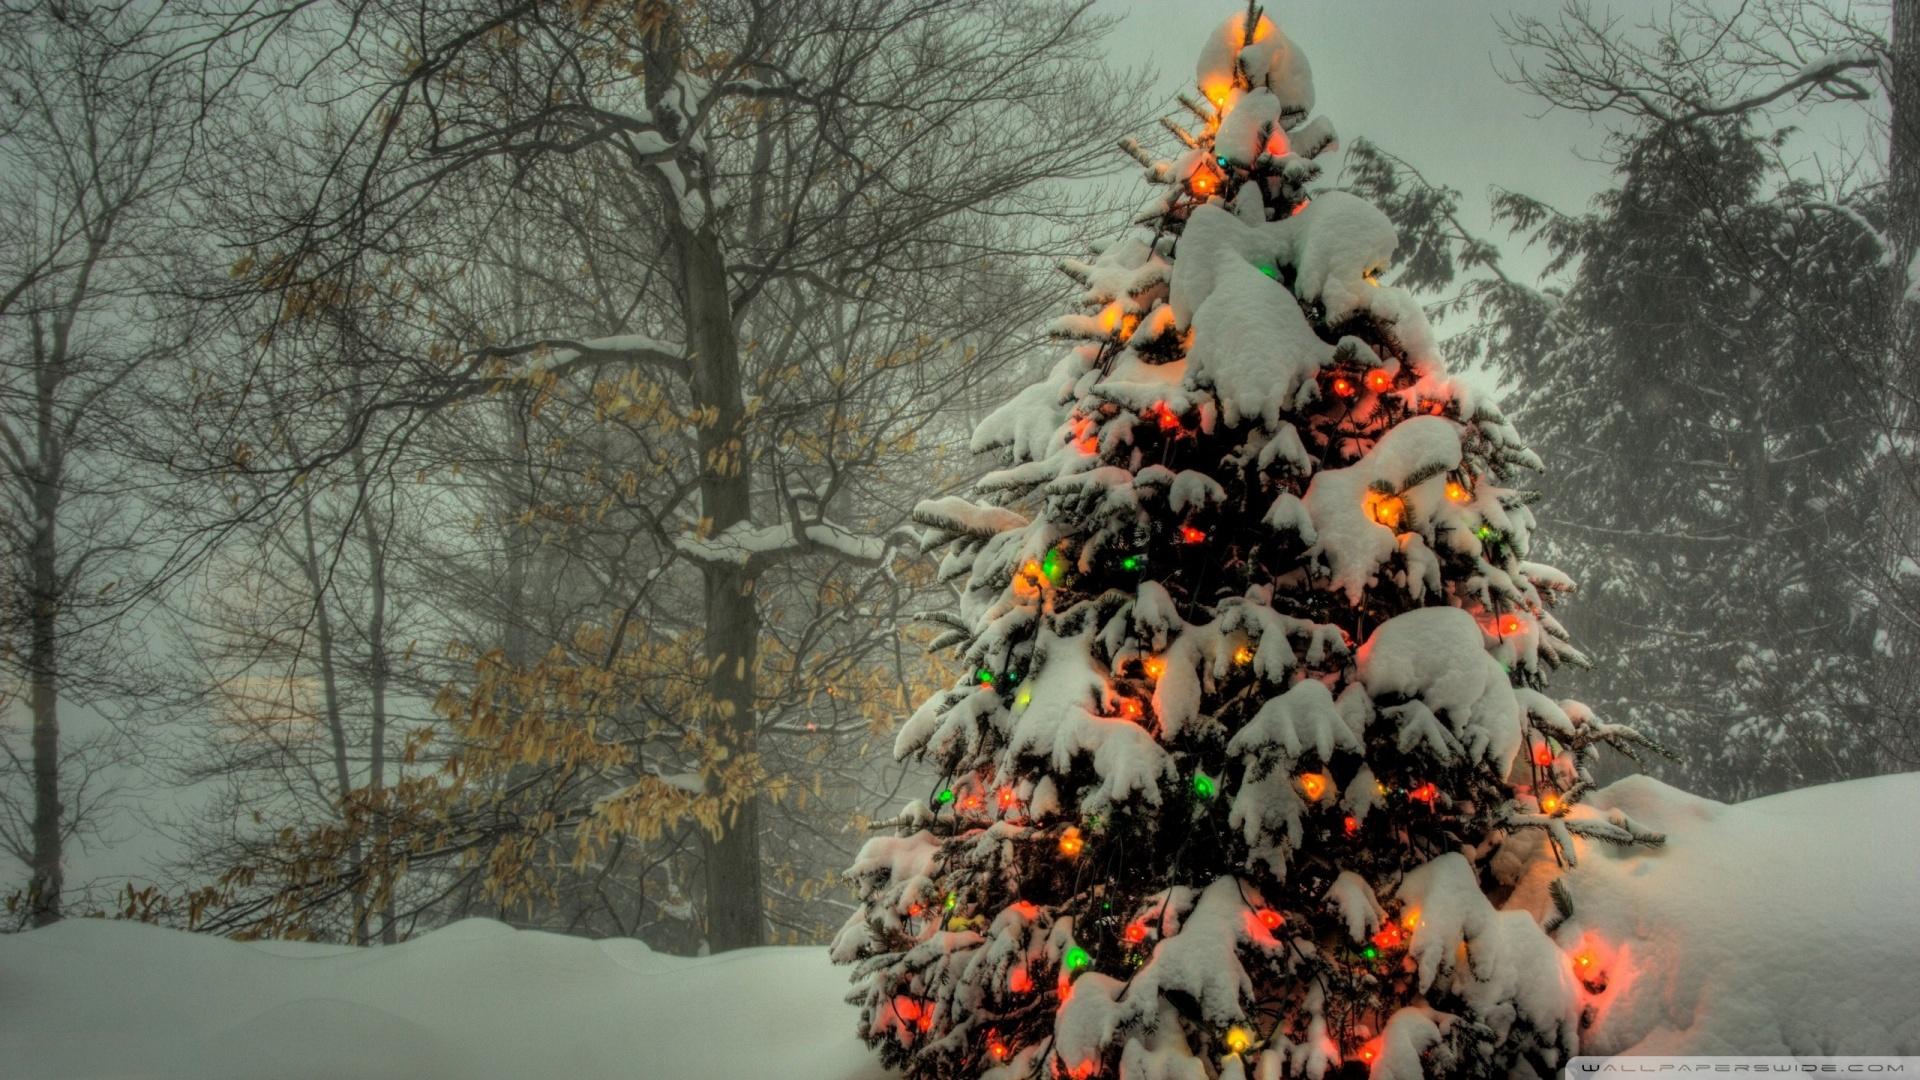 Christmas Tree Outside Wallpaper 1920x1080 Hanging Balls